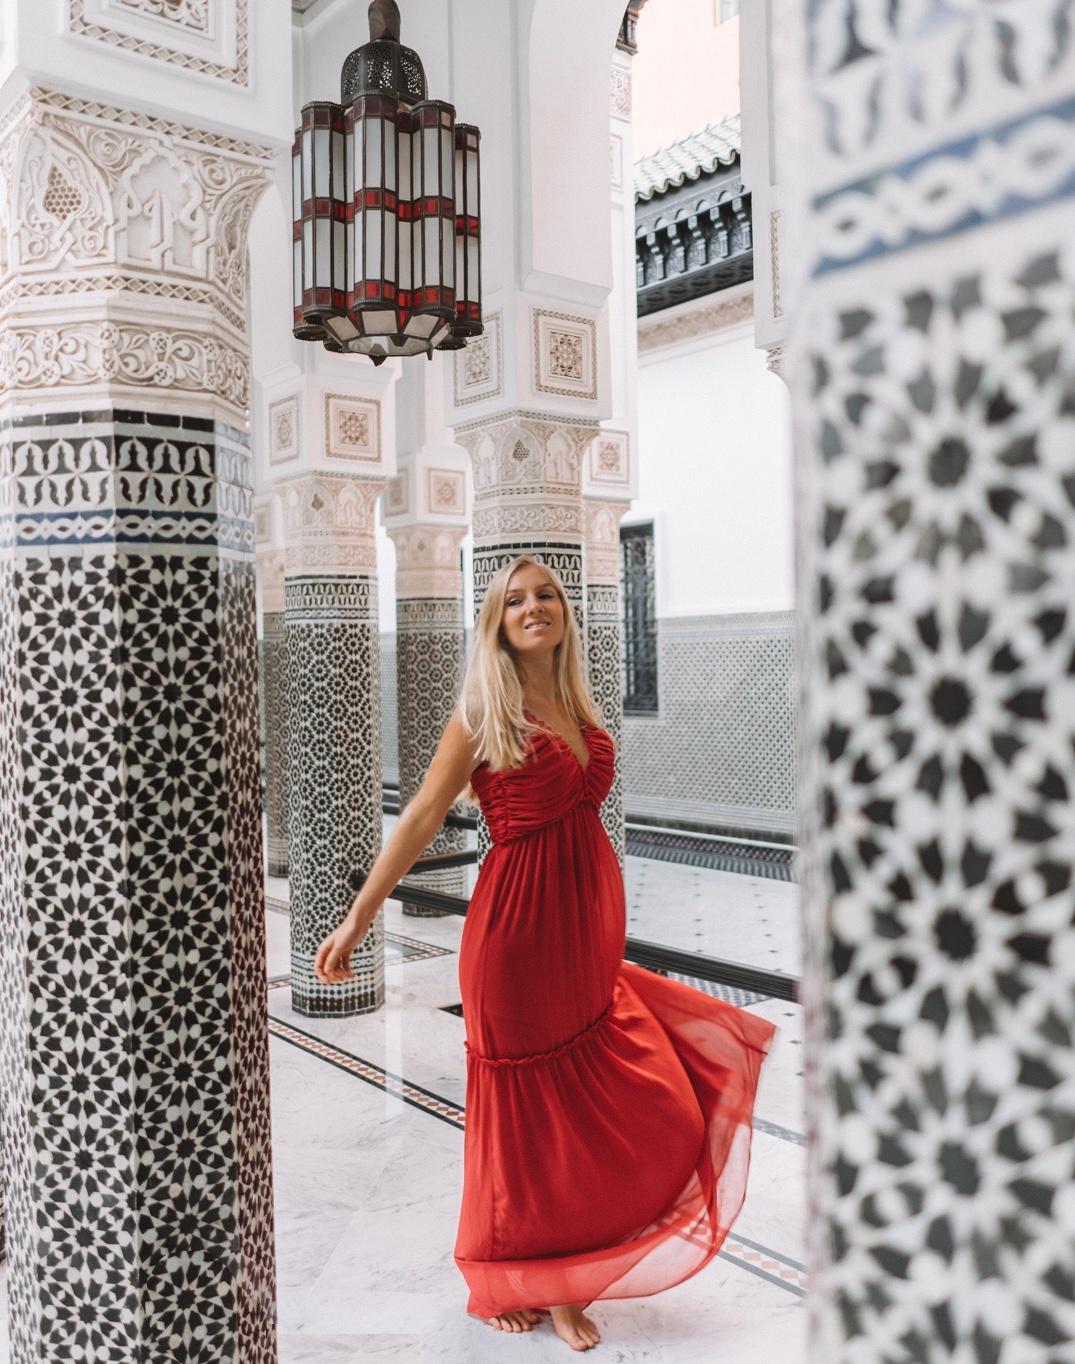 Our experience in Marrakech La Momounia